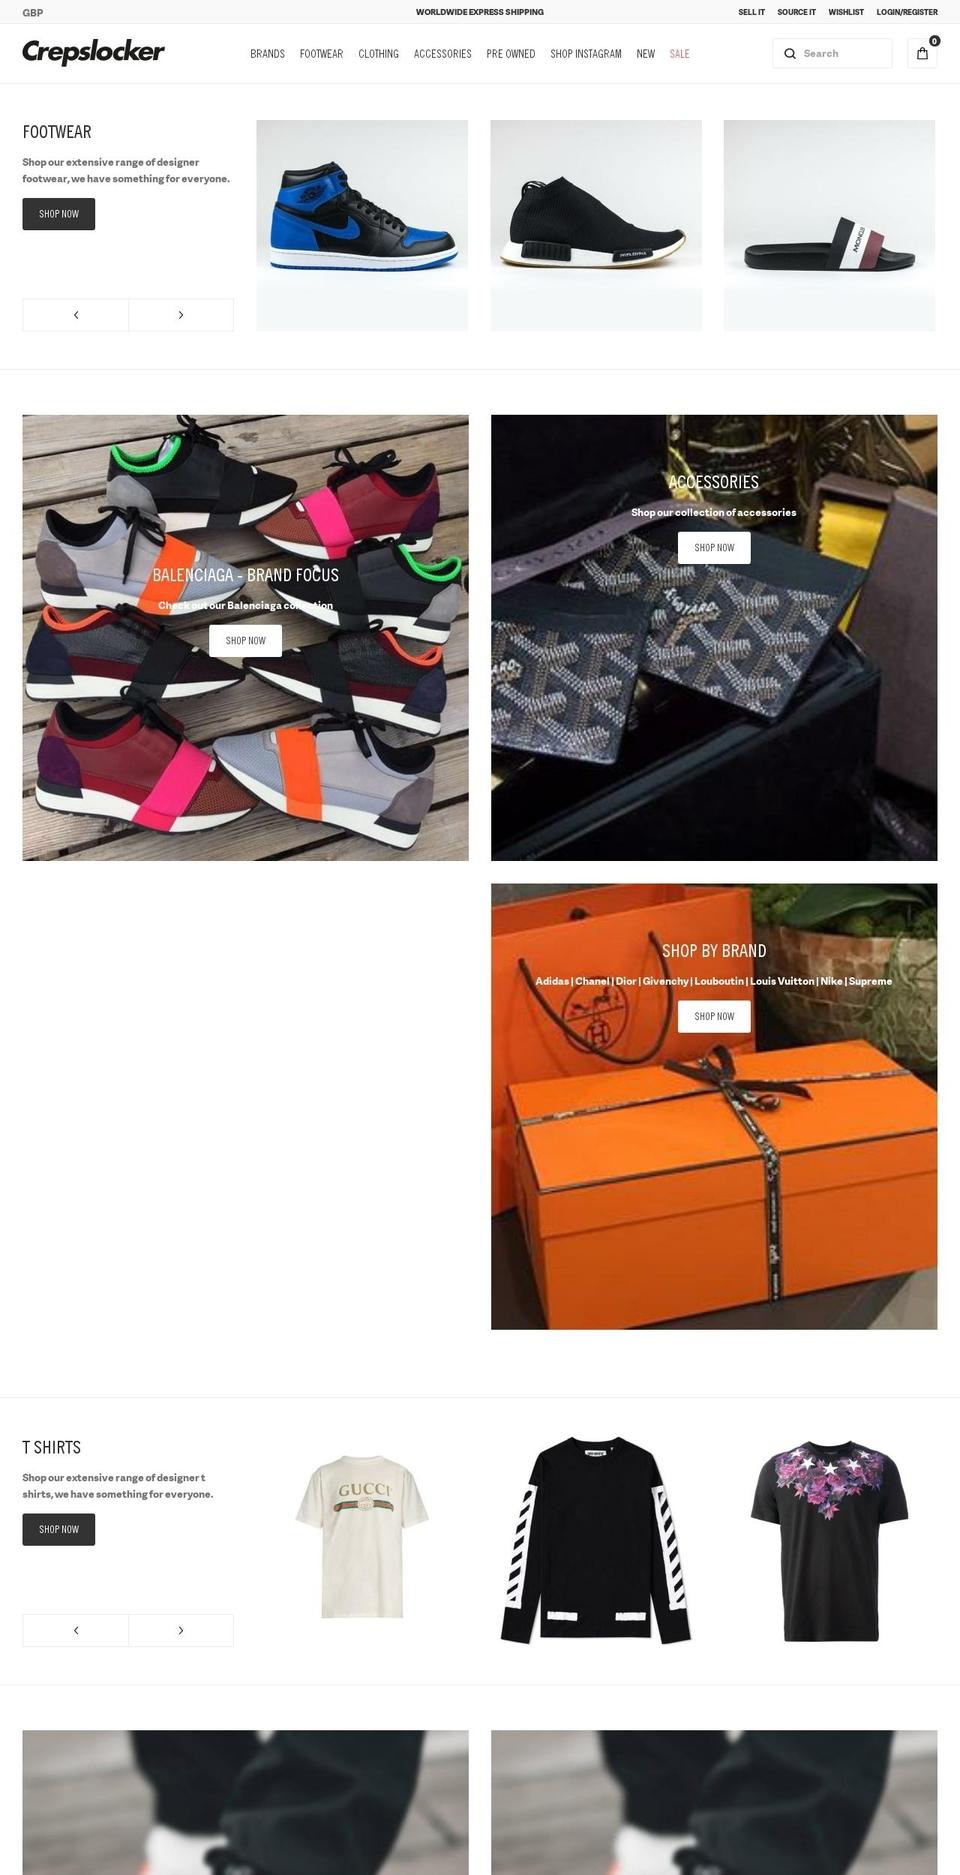 9e5dac73a06 Crepslocker Theme by BAO Agency Shopify theme websites examples ...